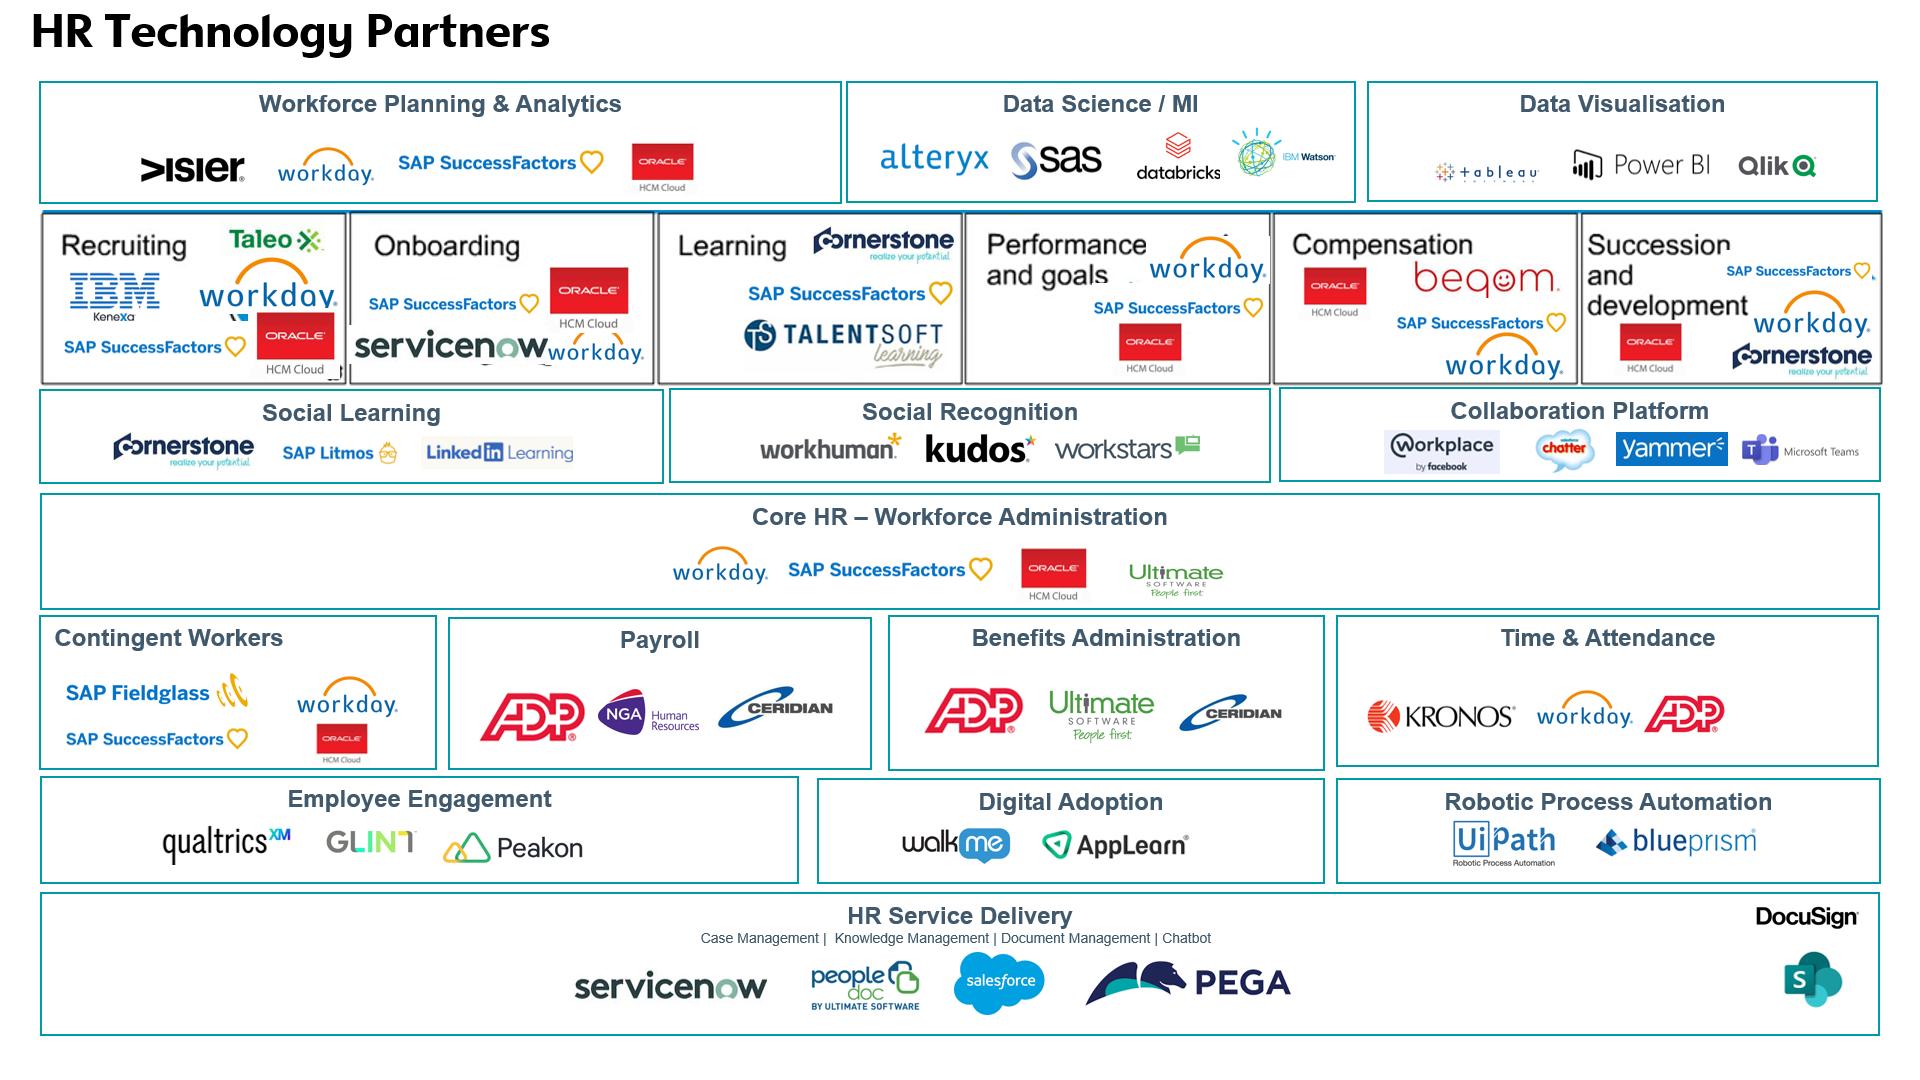 HR Technology ecosystem, HR Technology vendors, HRIS software